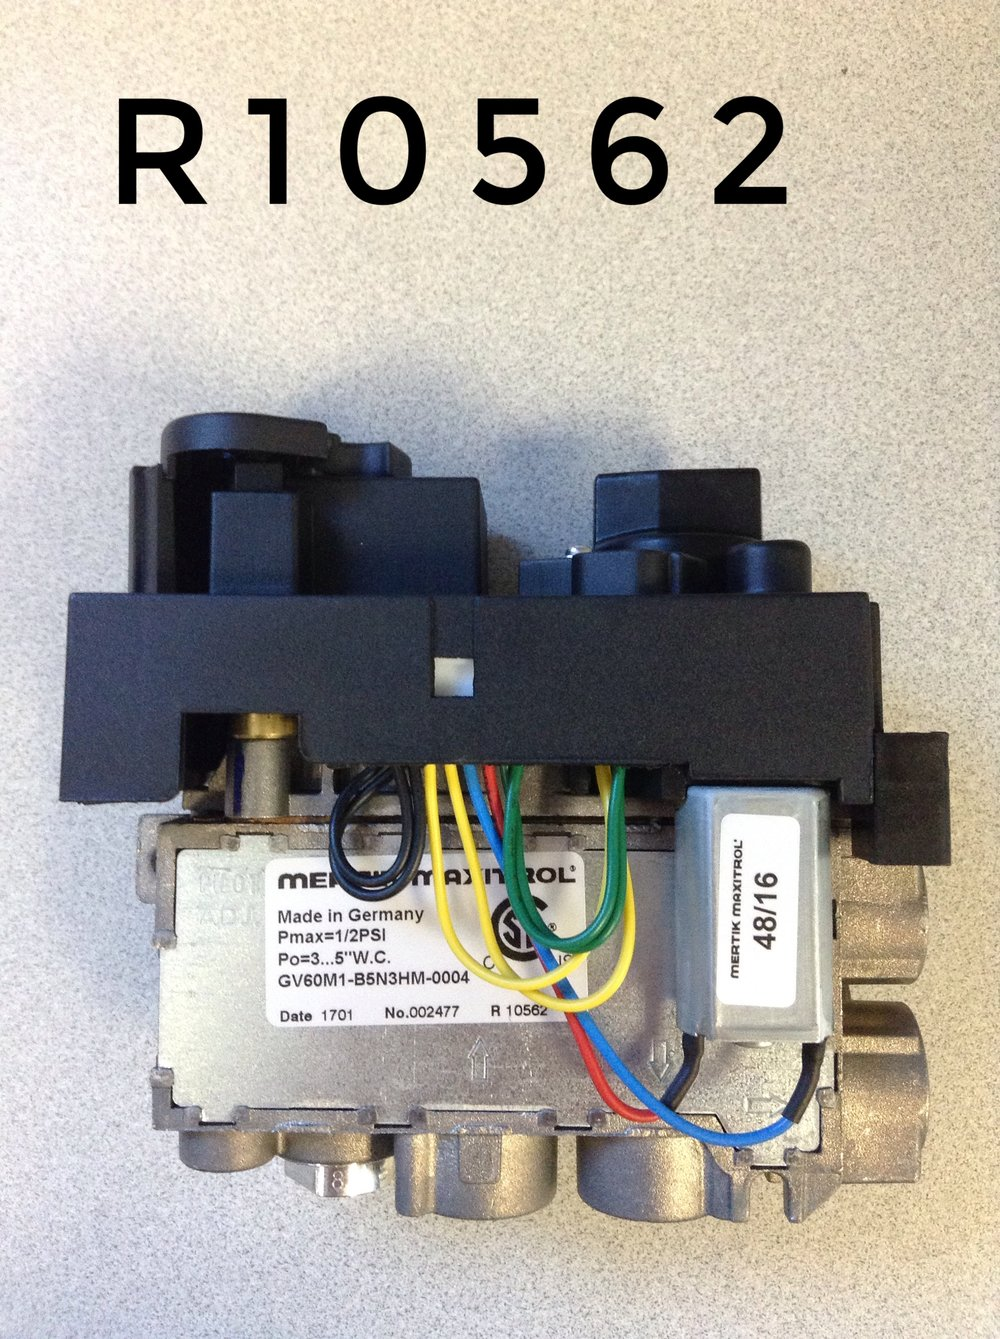 R10562 (1).JPG